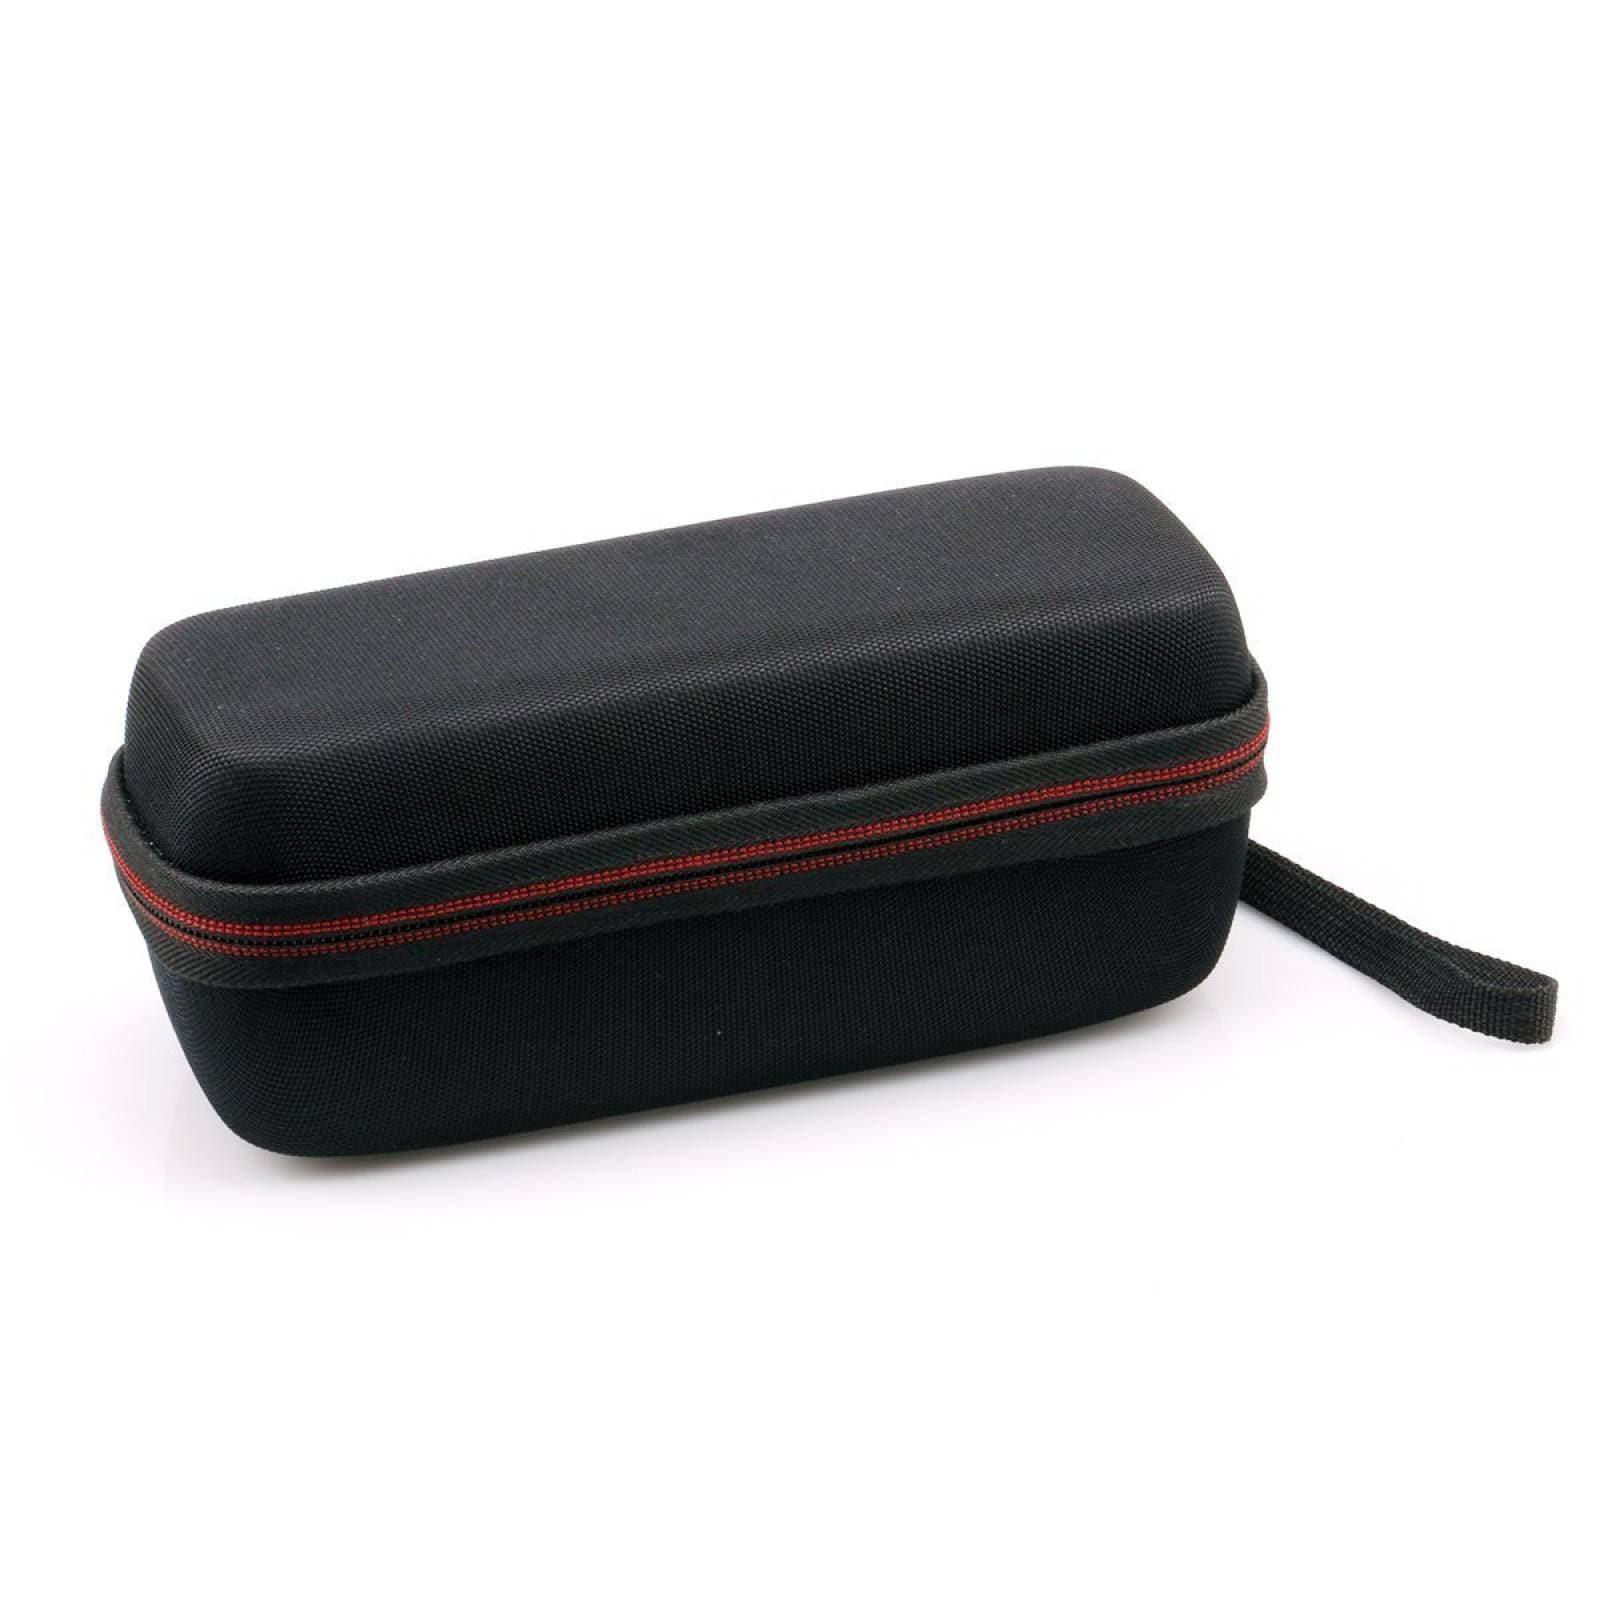 LTGEM funda JBL Flip 3 JBL Flip 4 Bluetooth Speaker.Se ajus